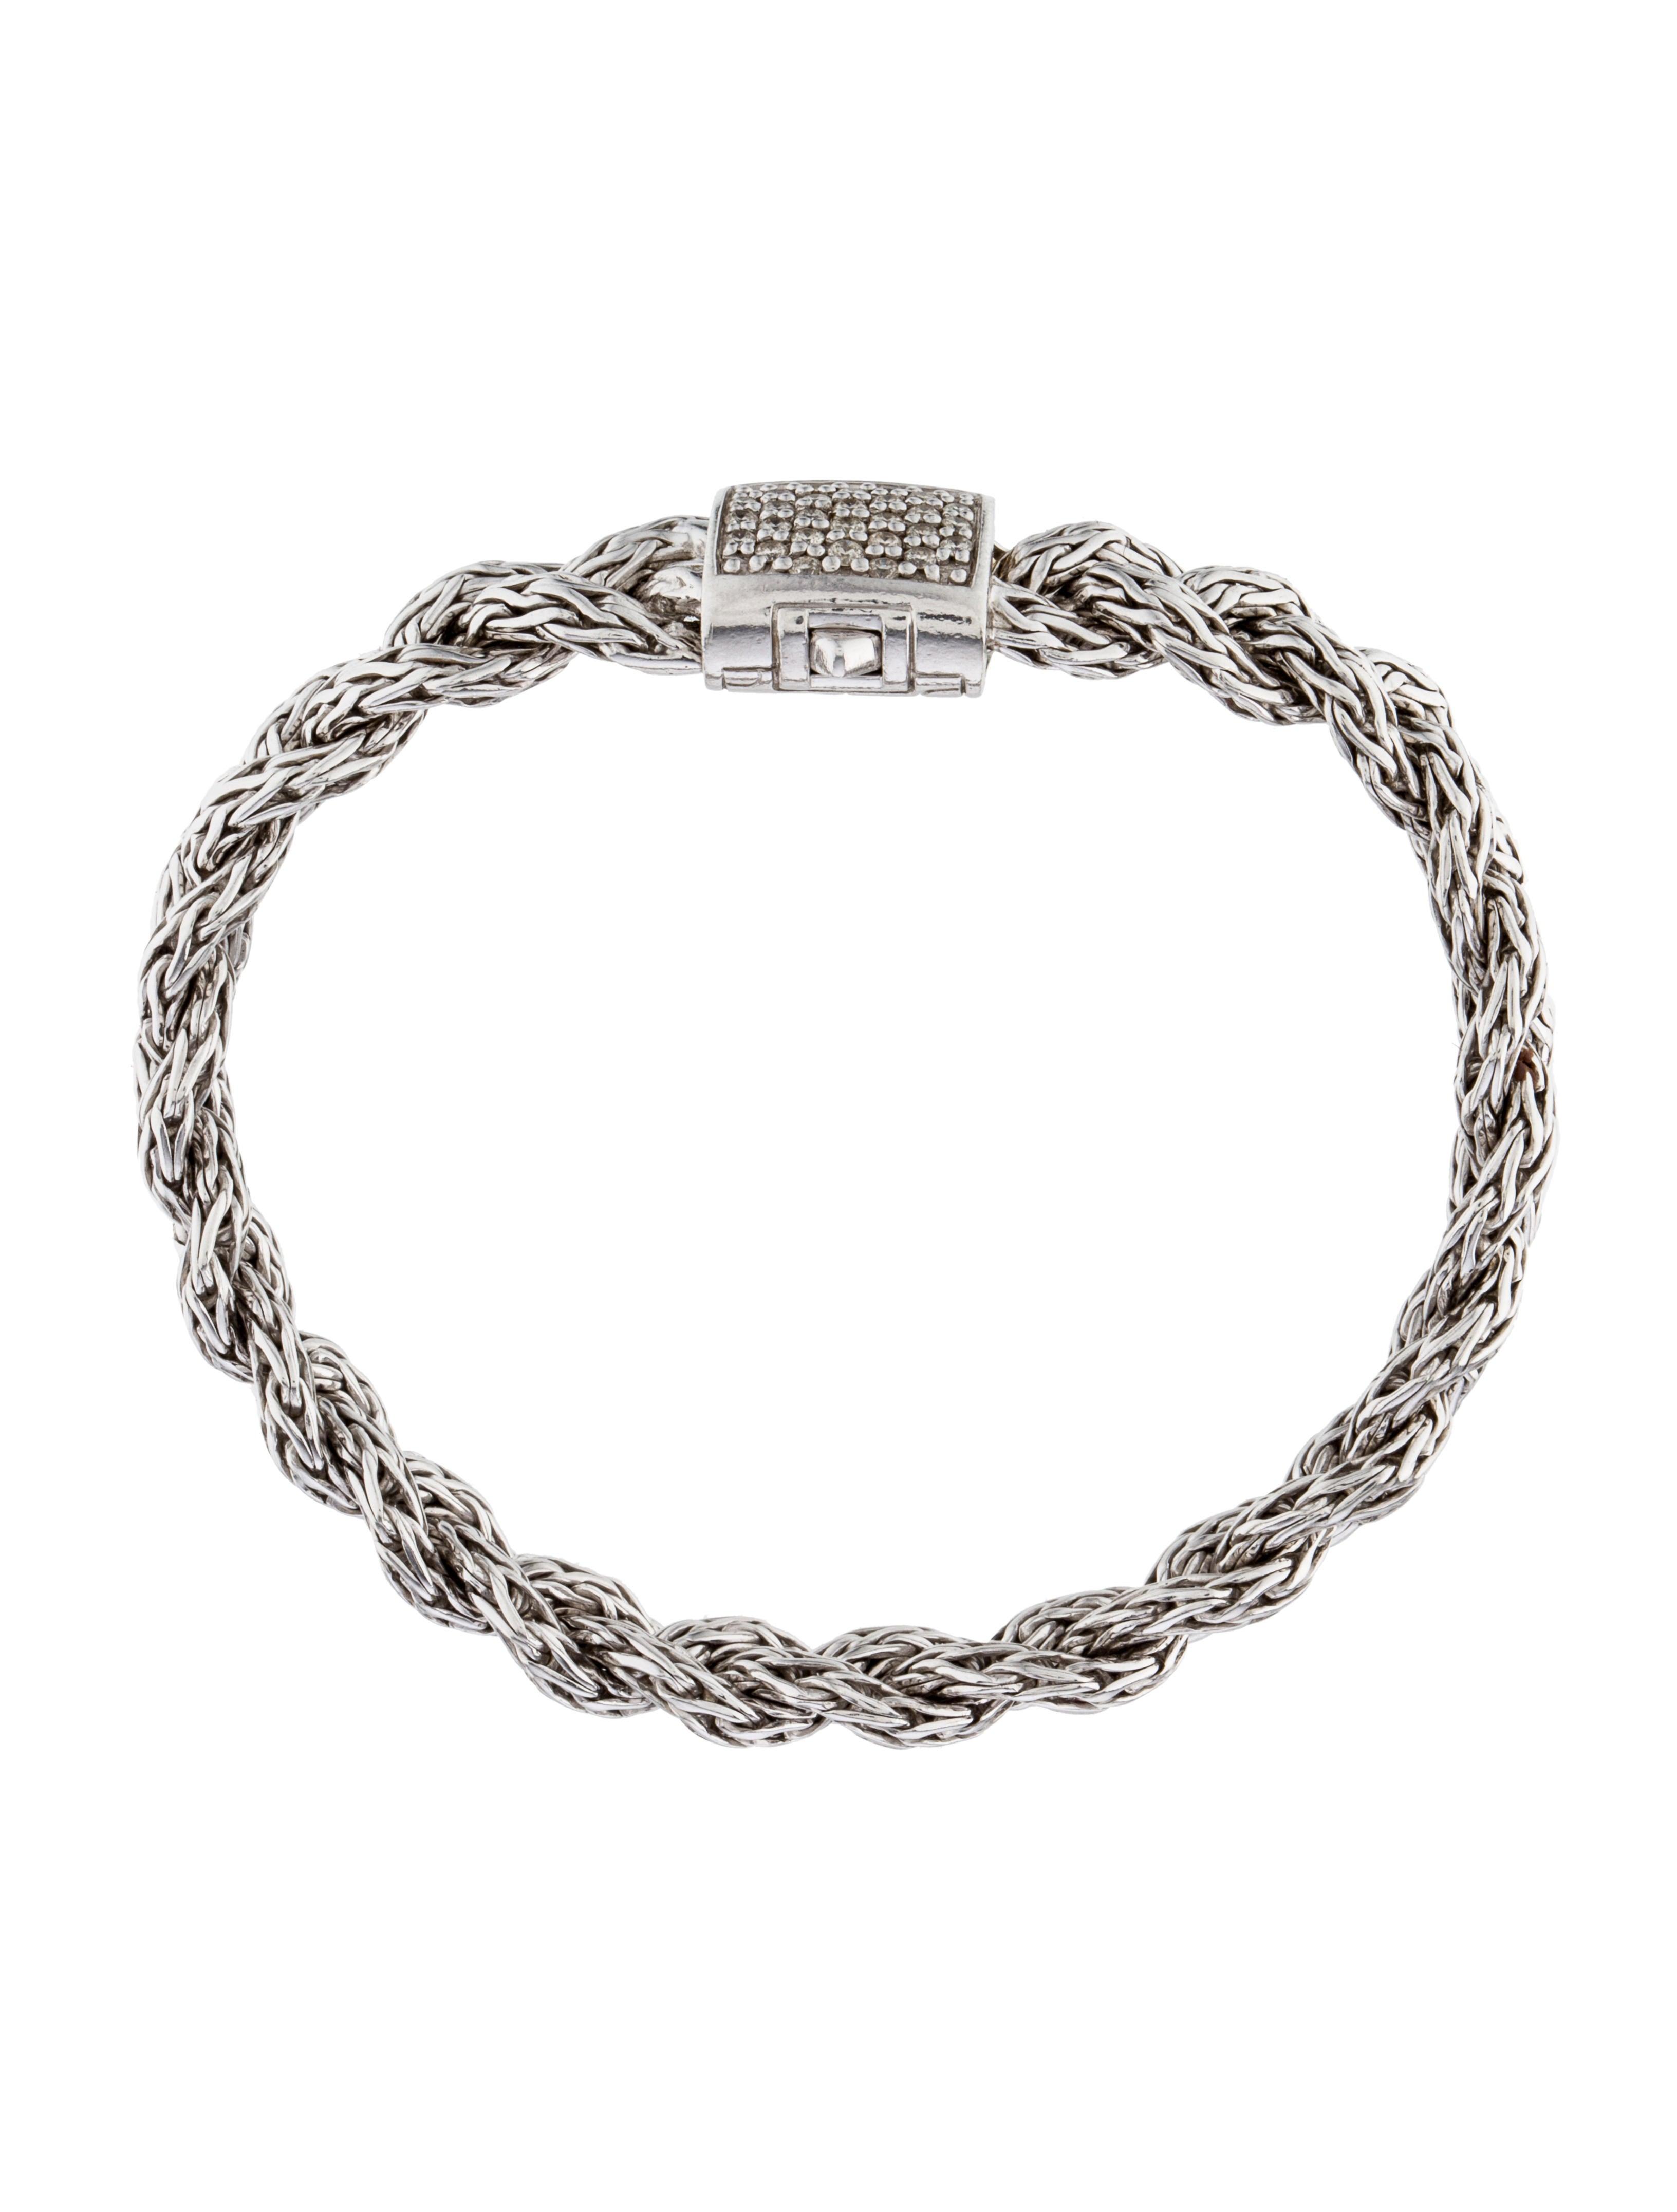 John Hardy Pav 233 Diamond Classic Chain Braided Bracelet